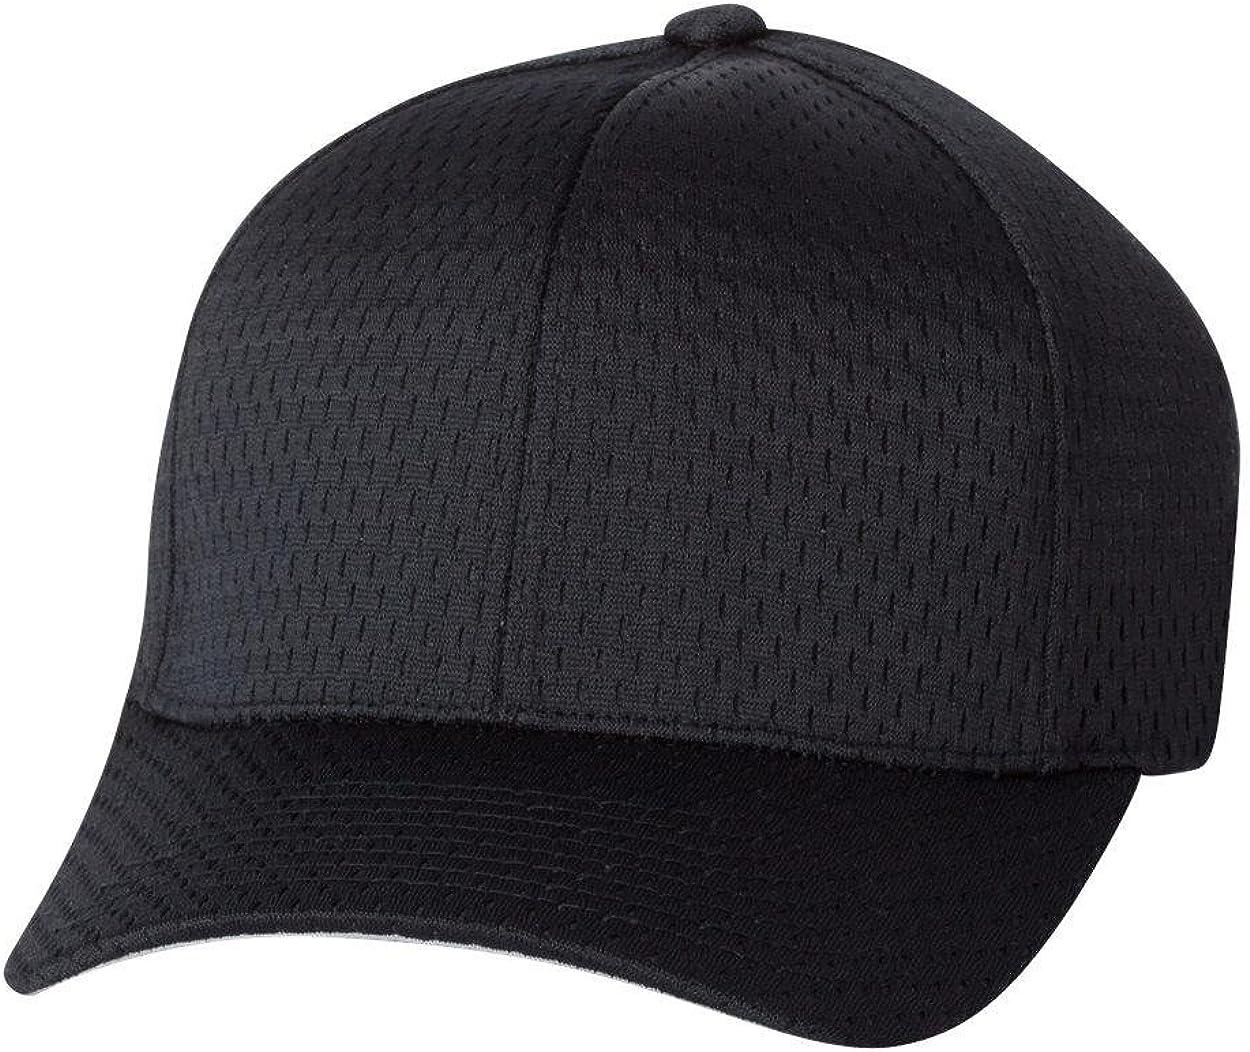 Flexfit 6777 - Athletic Mesh Cap Black